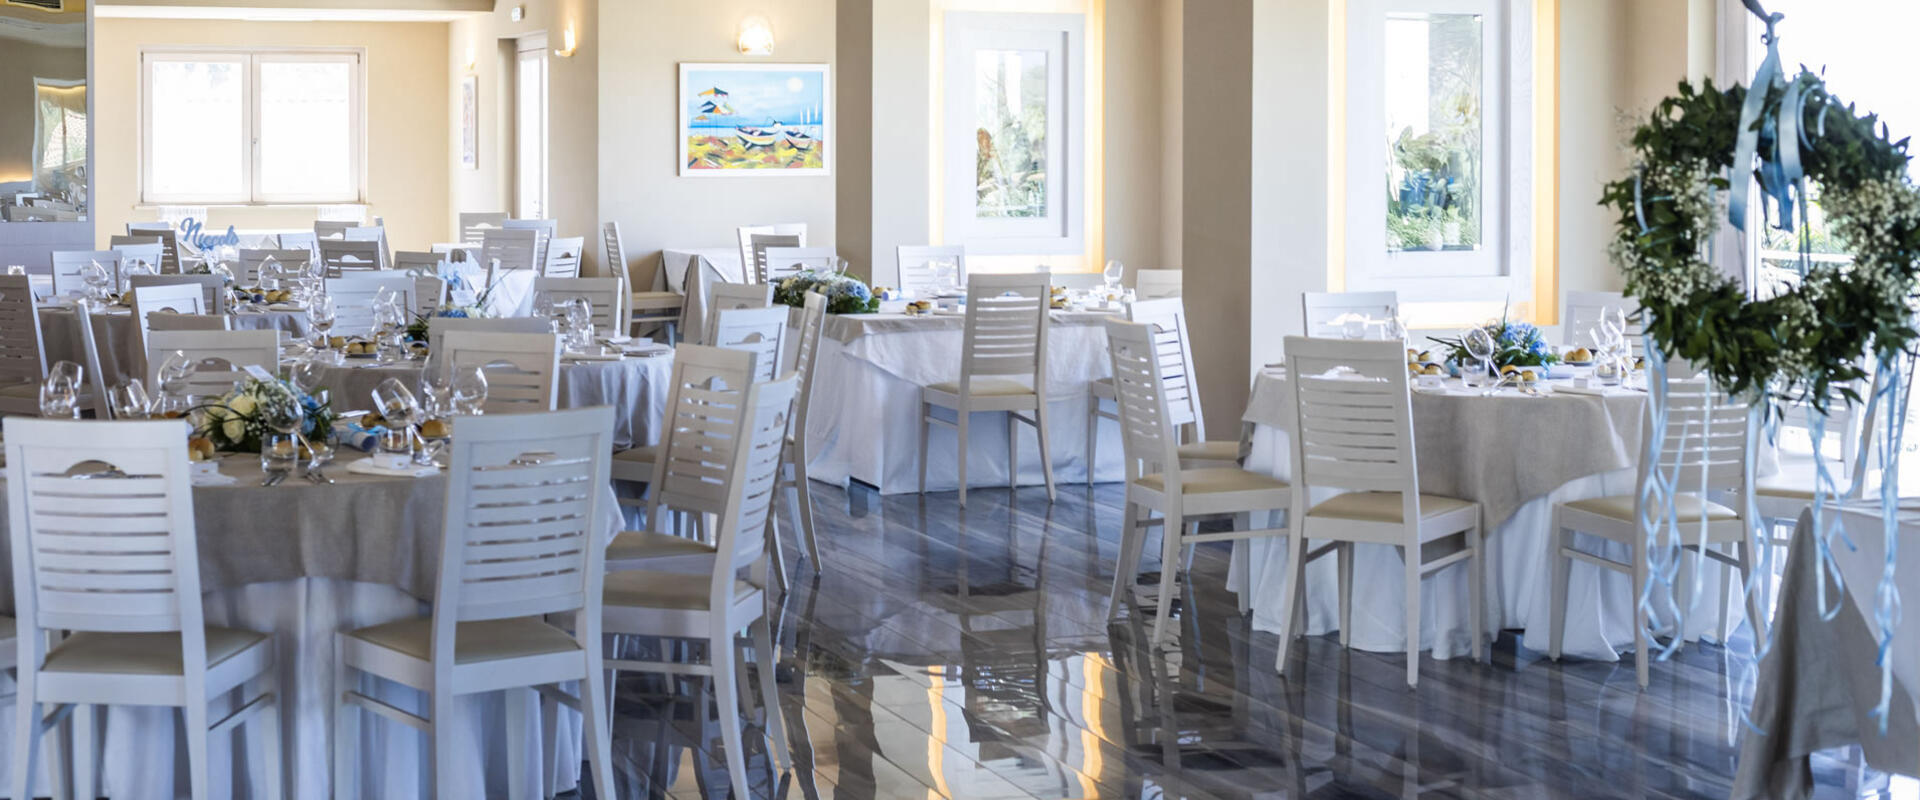 borgodonnacanfora it location-eventi-calabria 005